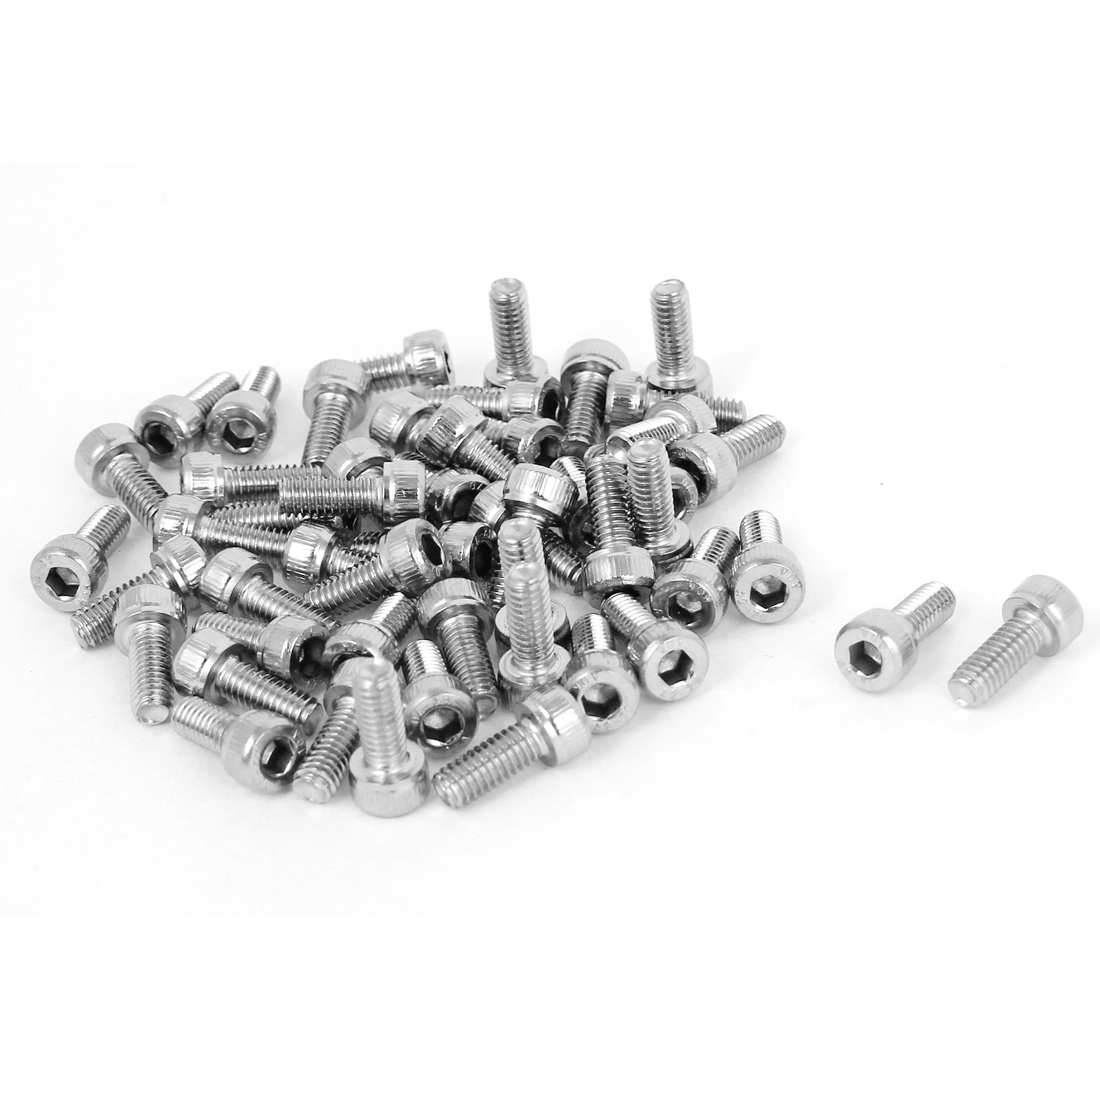 M4x10mm 0.7mm Pitch Stainless Steel Bolts Socket Cap Head Hex Key Screws 50pcs